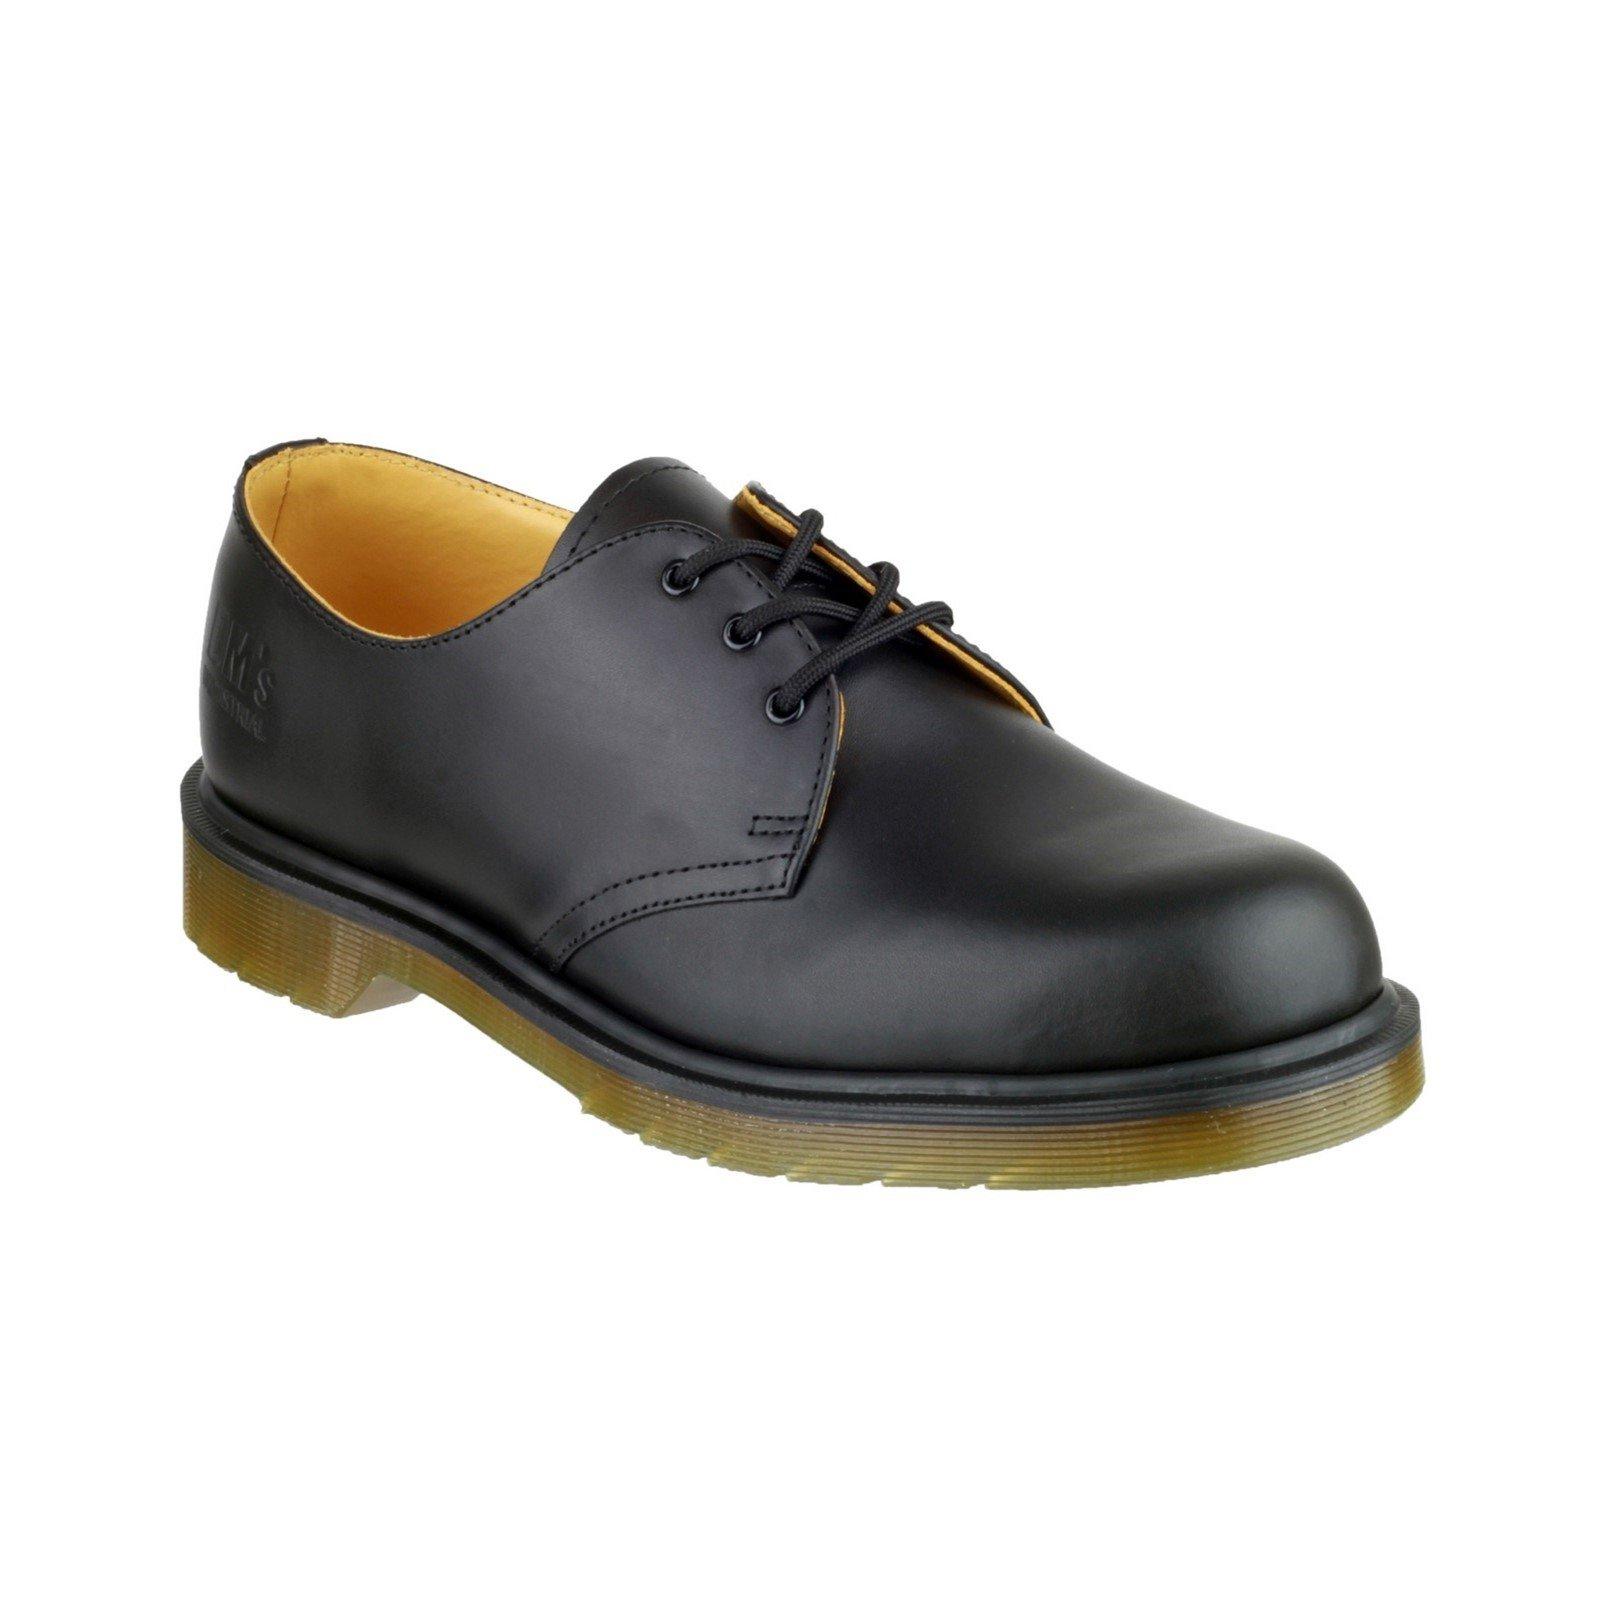 Dr Martens Men's Lace-Up Leather Derby Shoe Black 04915 - Black 11